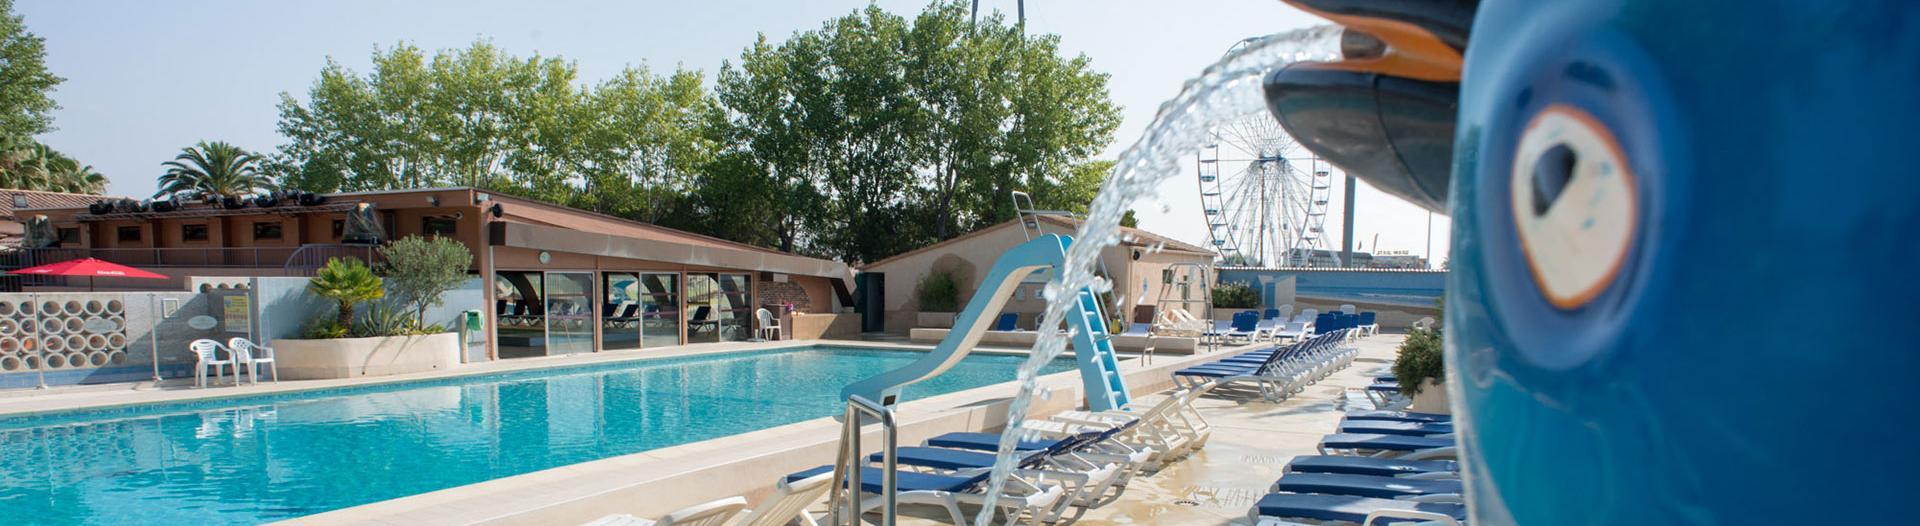 slider-Abri-de-Camargue-piscine-exterieure